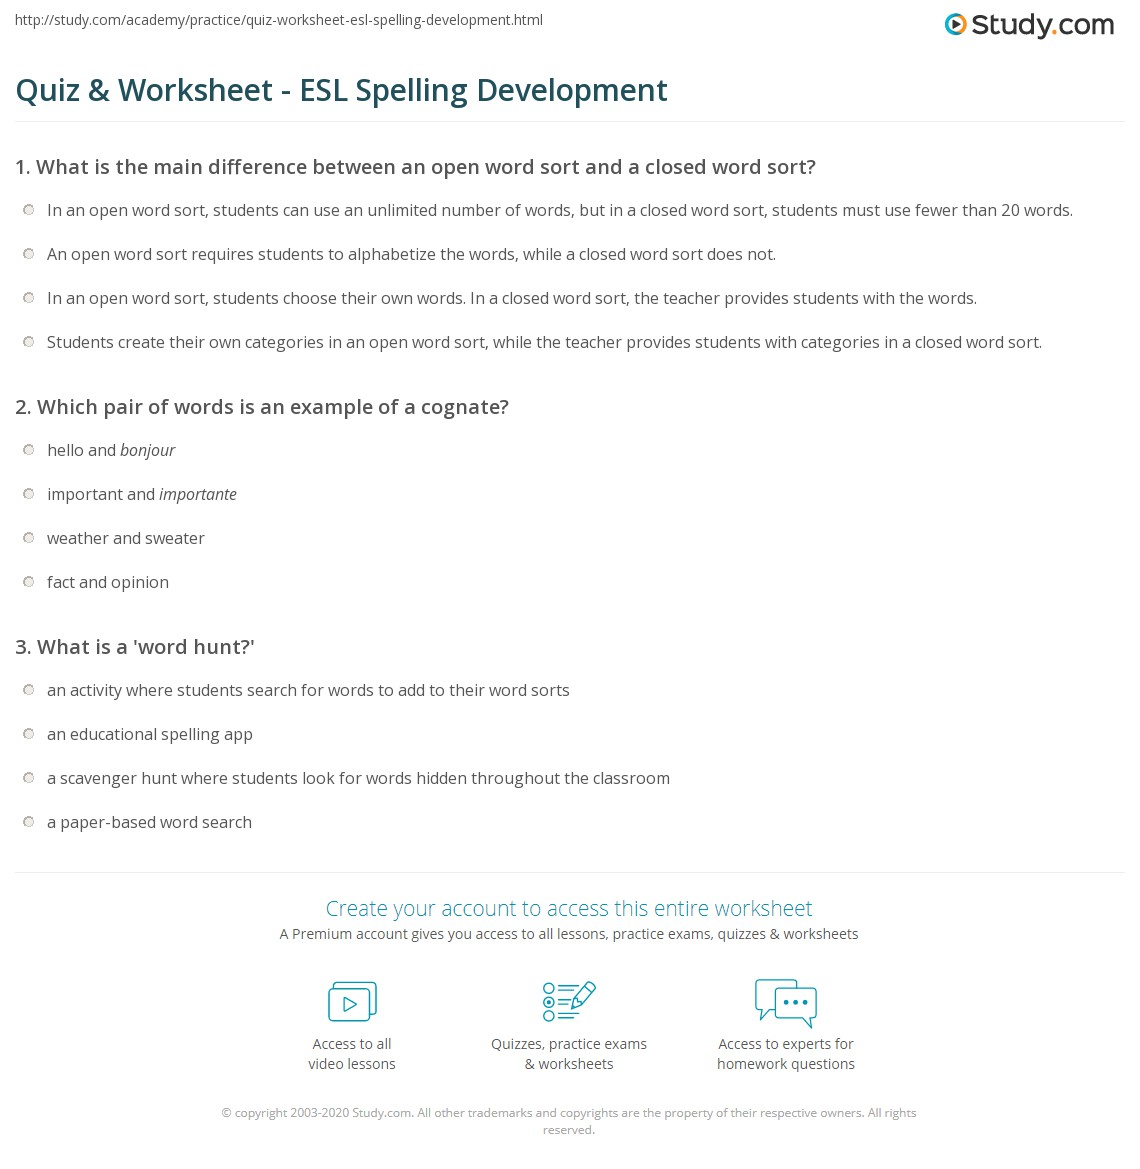 Quiz & Worksheet - ESL Spelling Development | Study.com